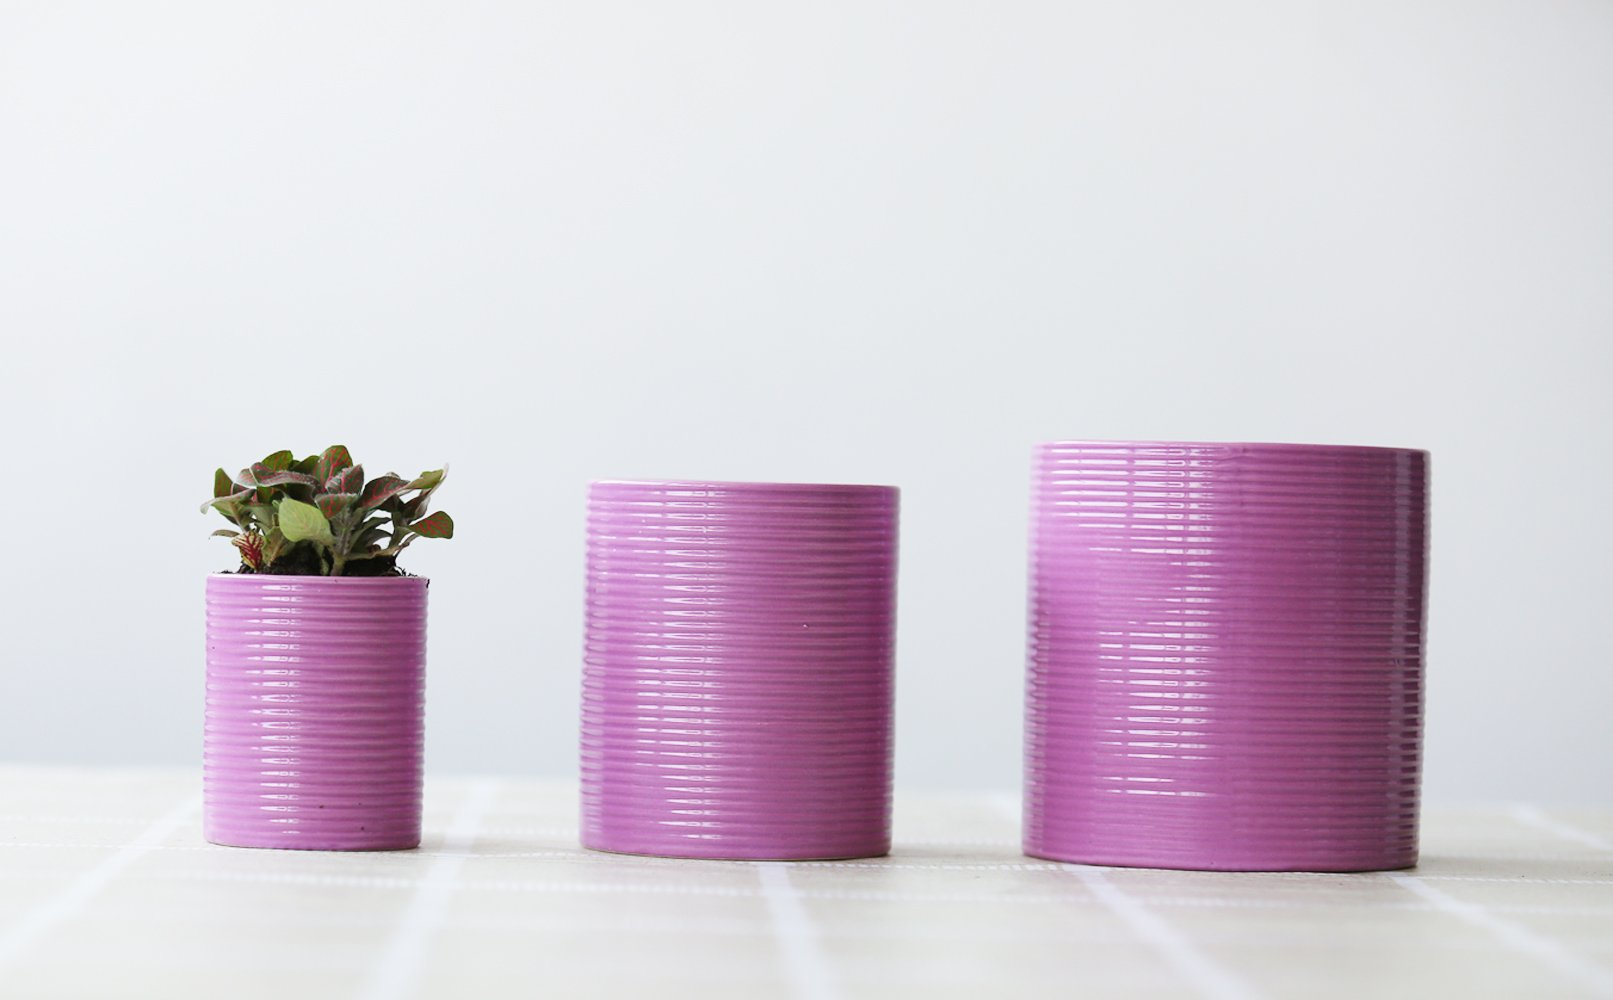 Better-way Modern Ceramic Orchid Planter Wave Design Plant Flower Container Pot (5inch, Light Purple)